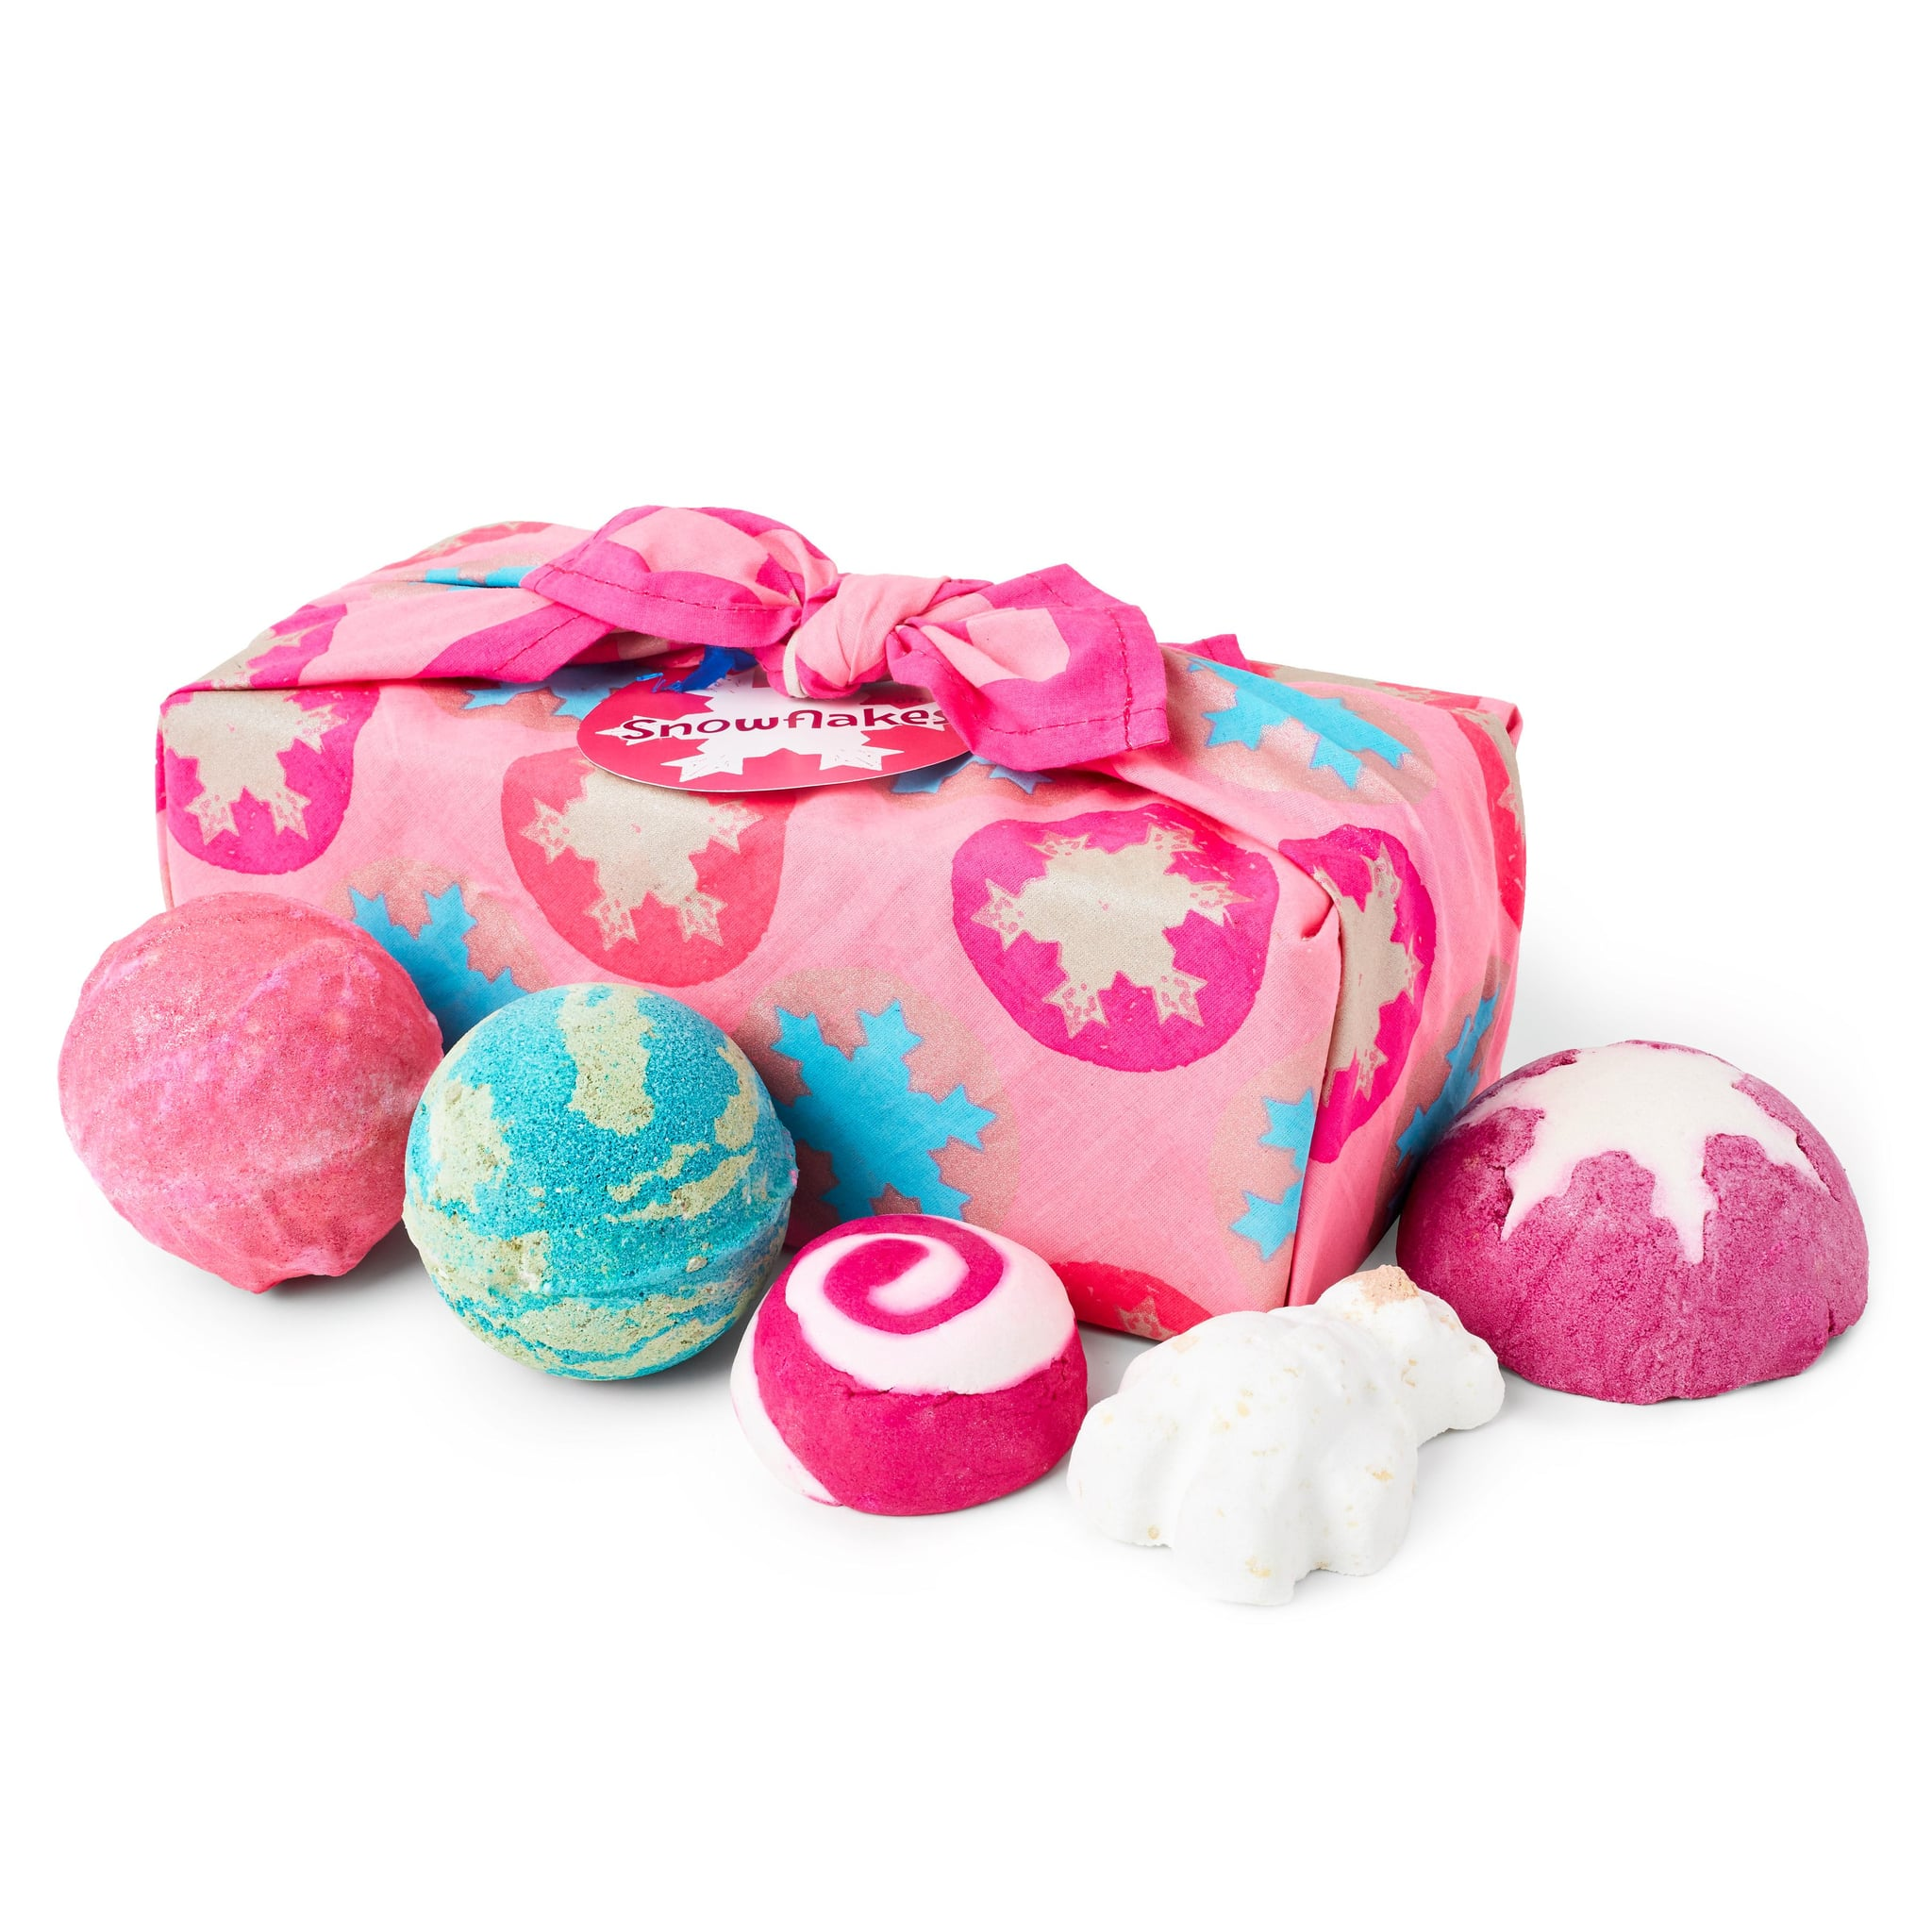 Lush Joy to the World | Lush Christmas Gifts 2017 | POPSUGAR Beauty ...